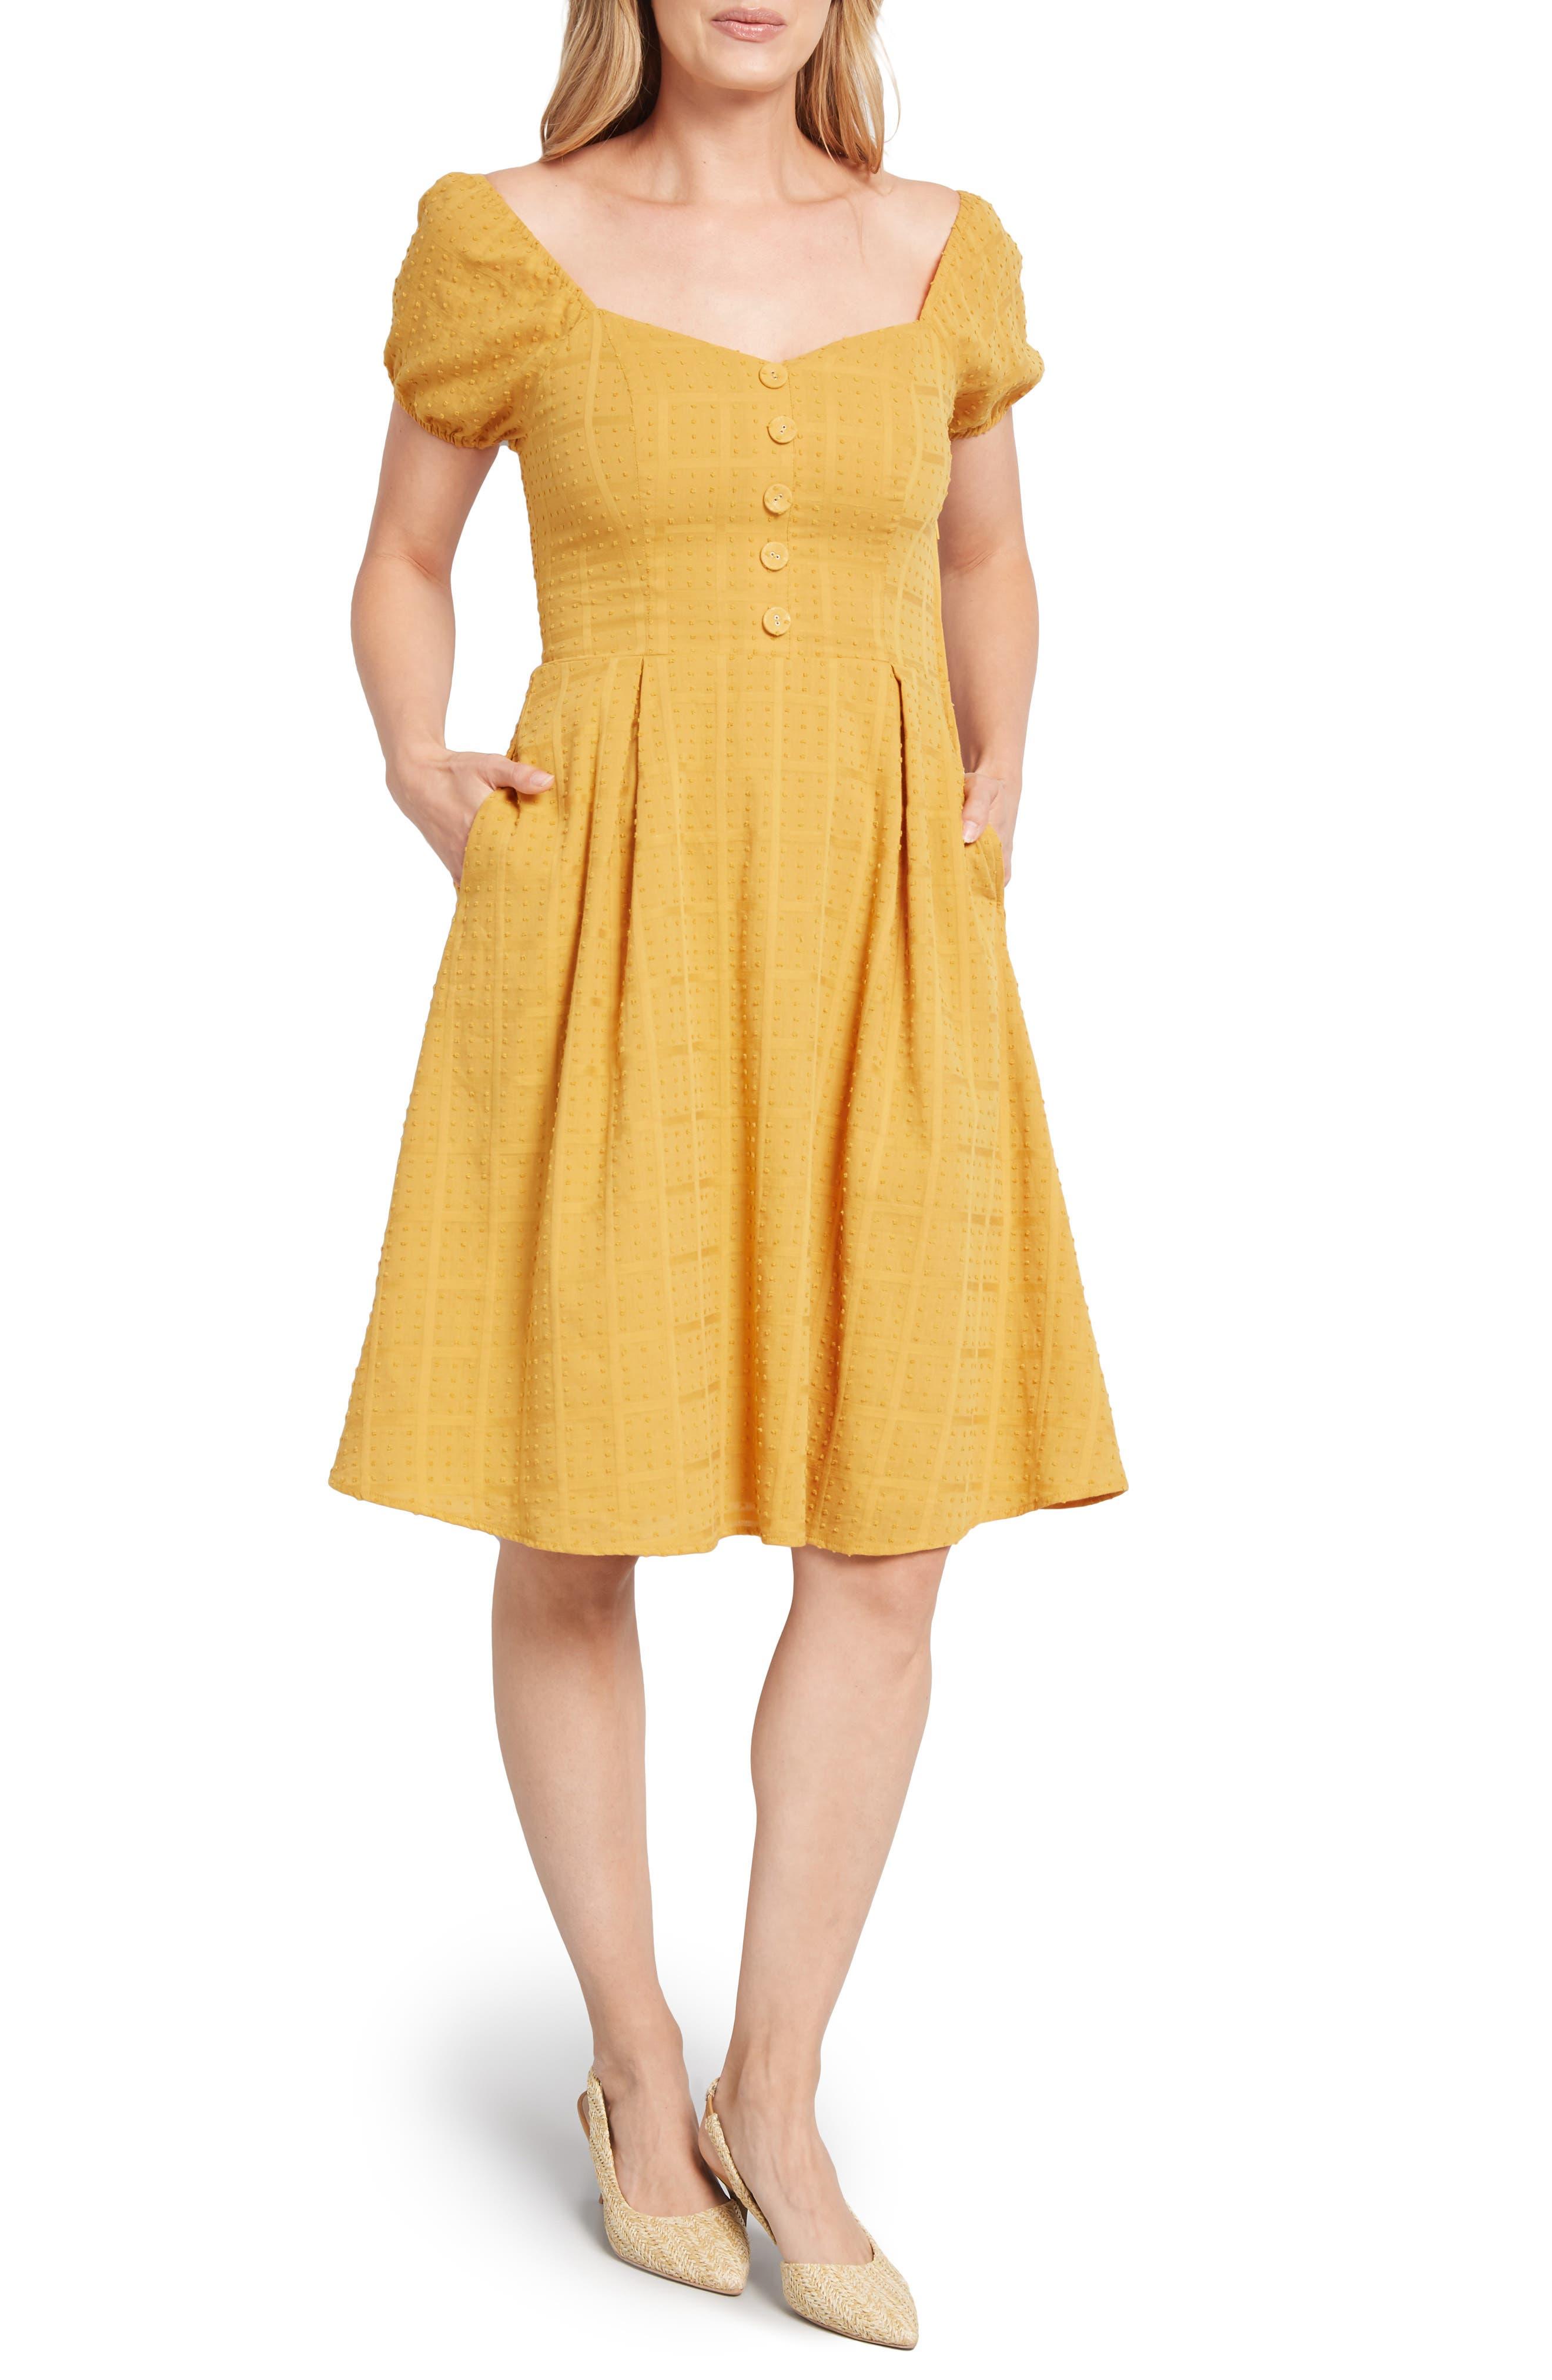 große Vielfalt Stile Großhandelsverkauf tolle sorten Women's Modcloth Sale   Nordstrom